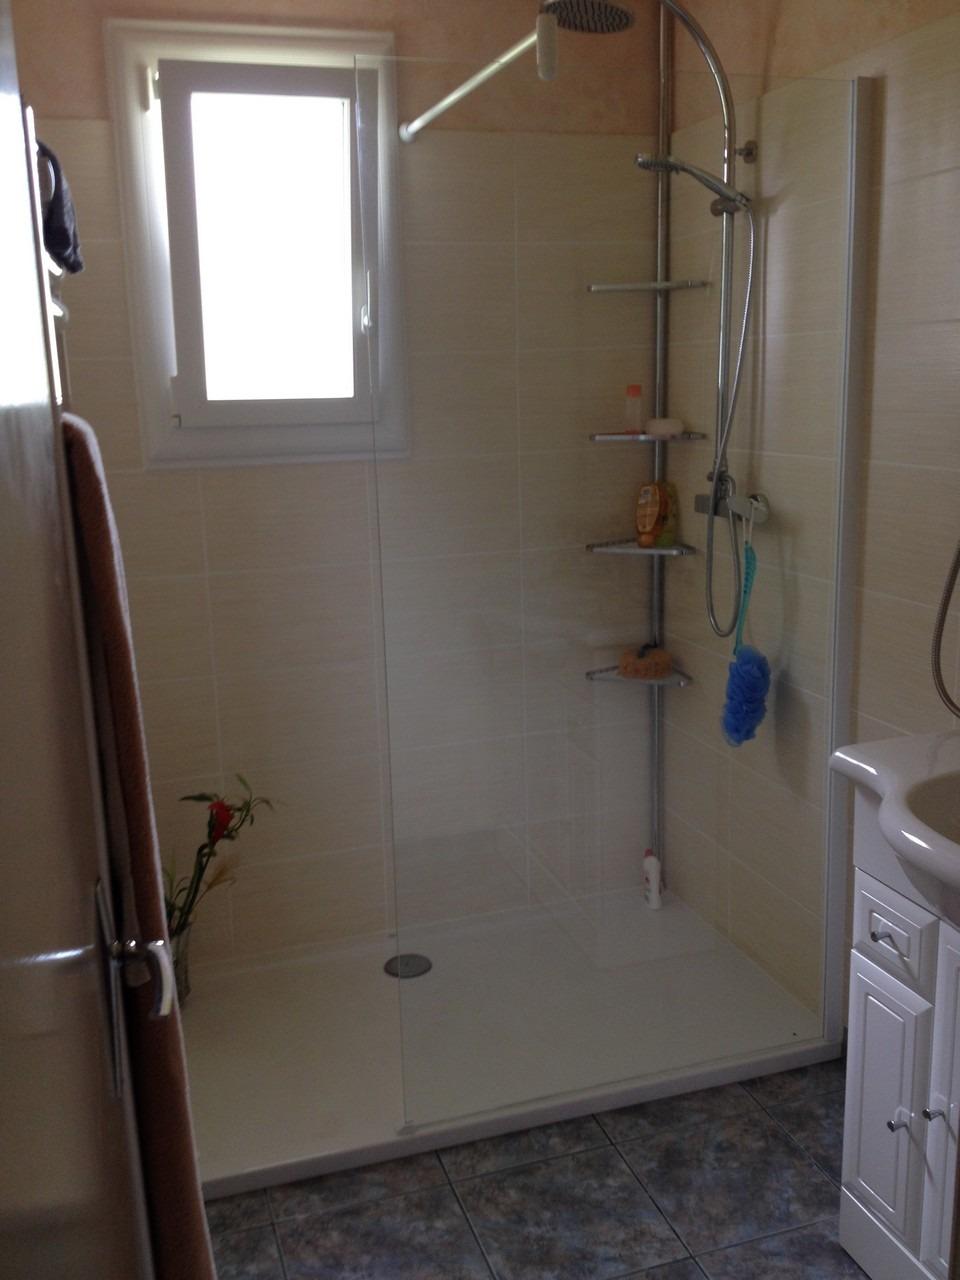 salle de bain legros - Galerie Chauffage / Plomberie